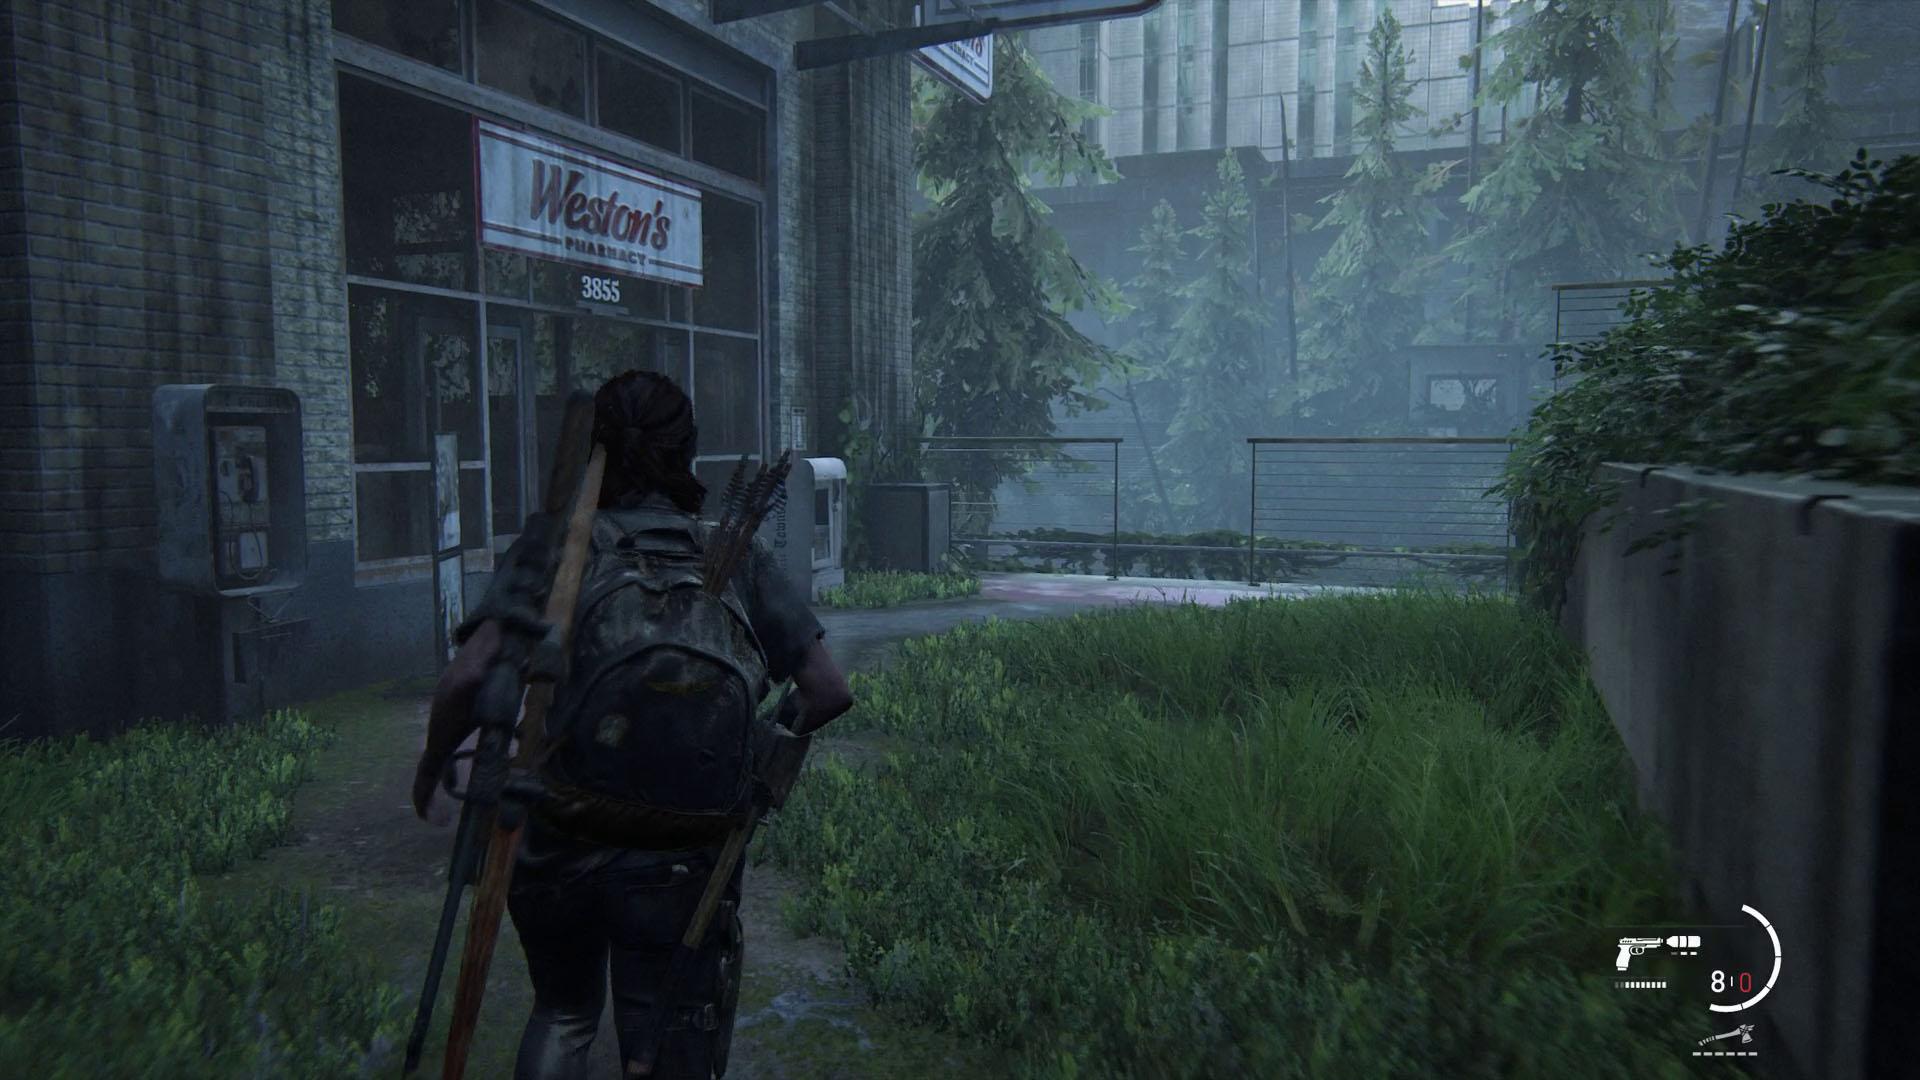 The Last of Us 2 safe codes - weston pharmacy safe